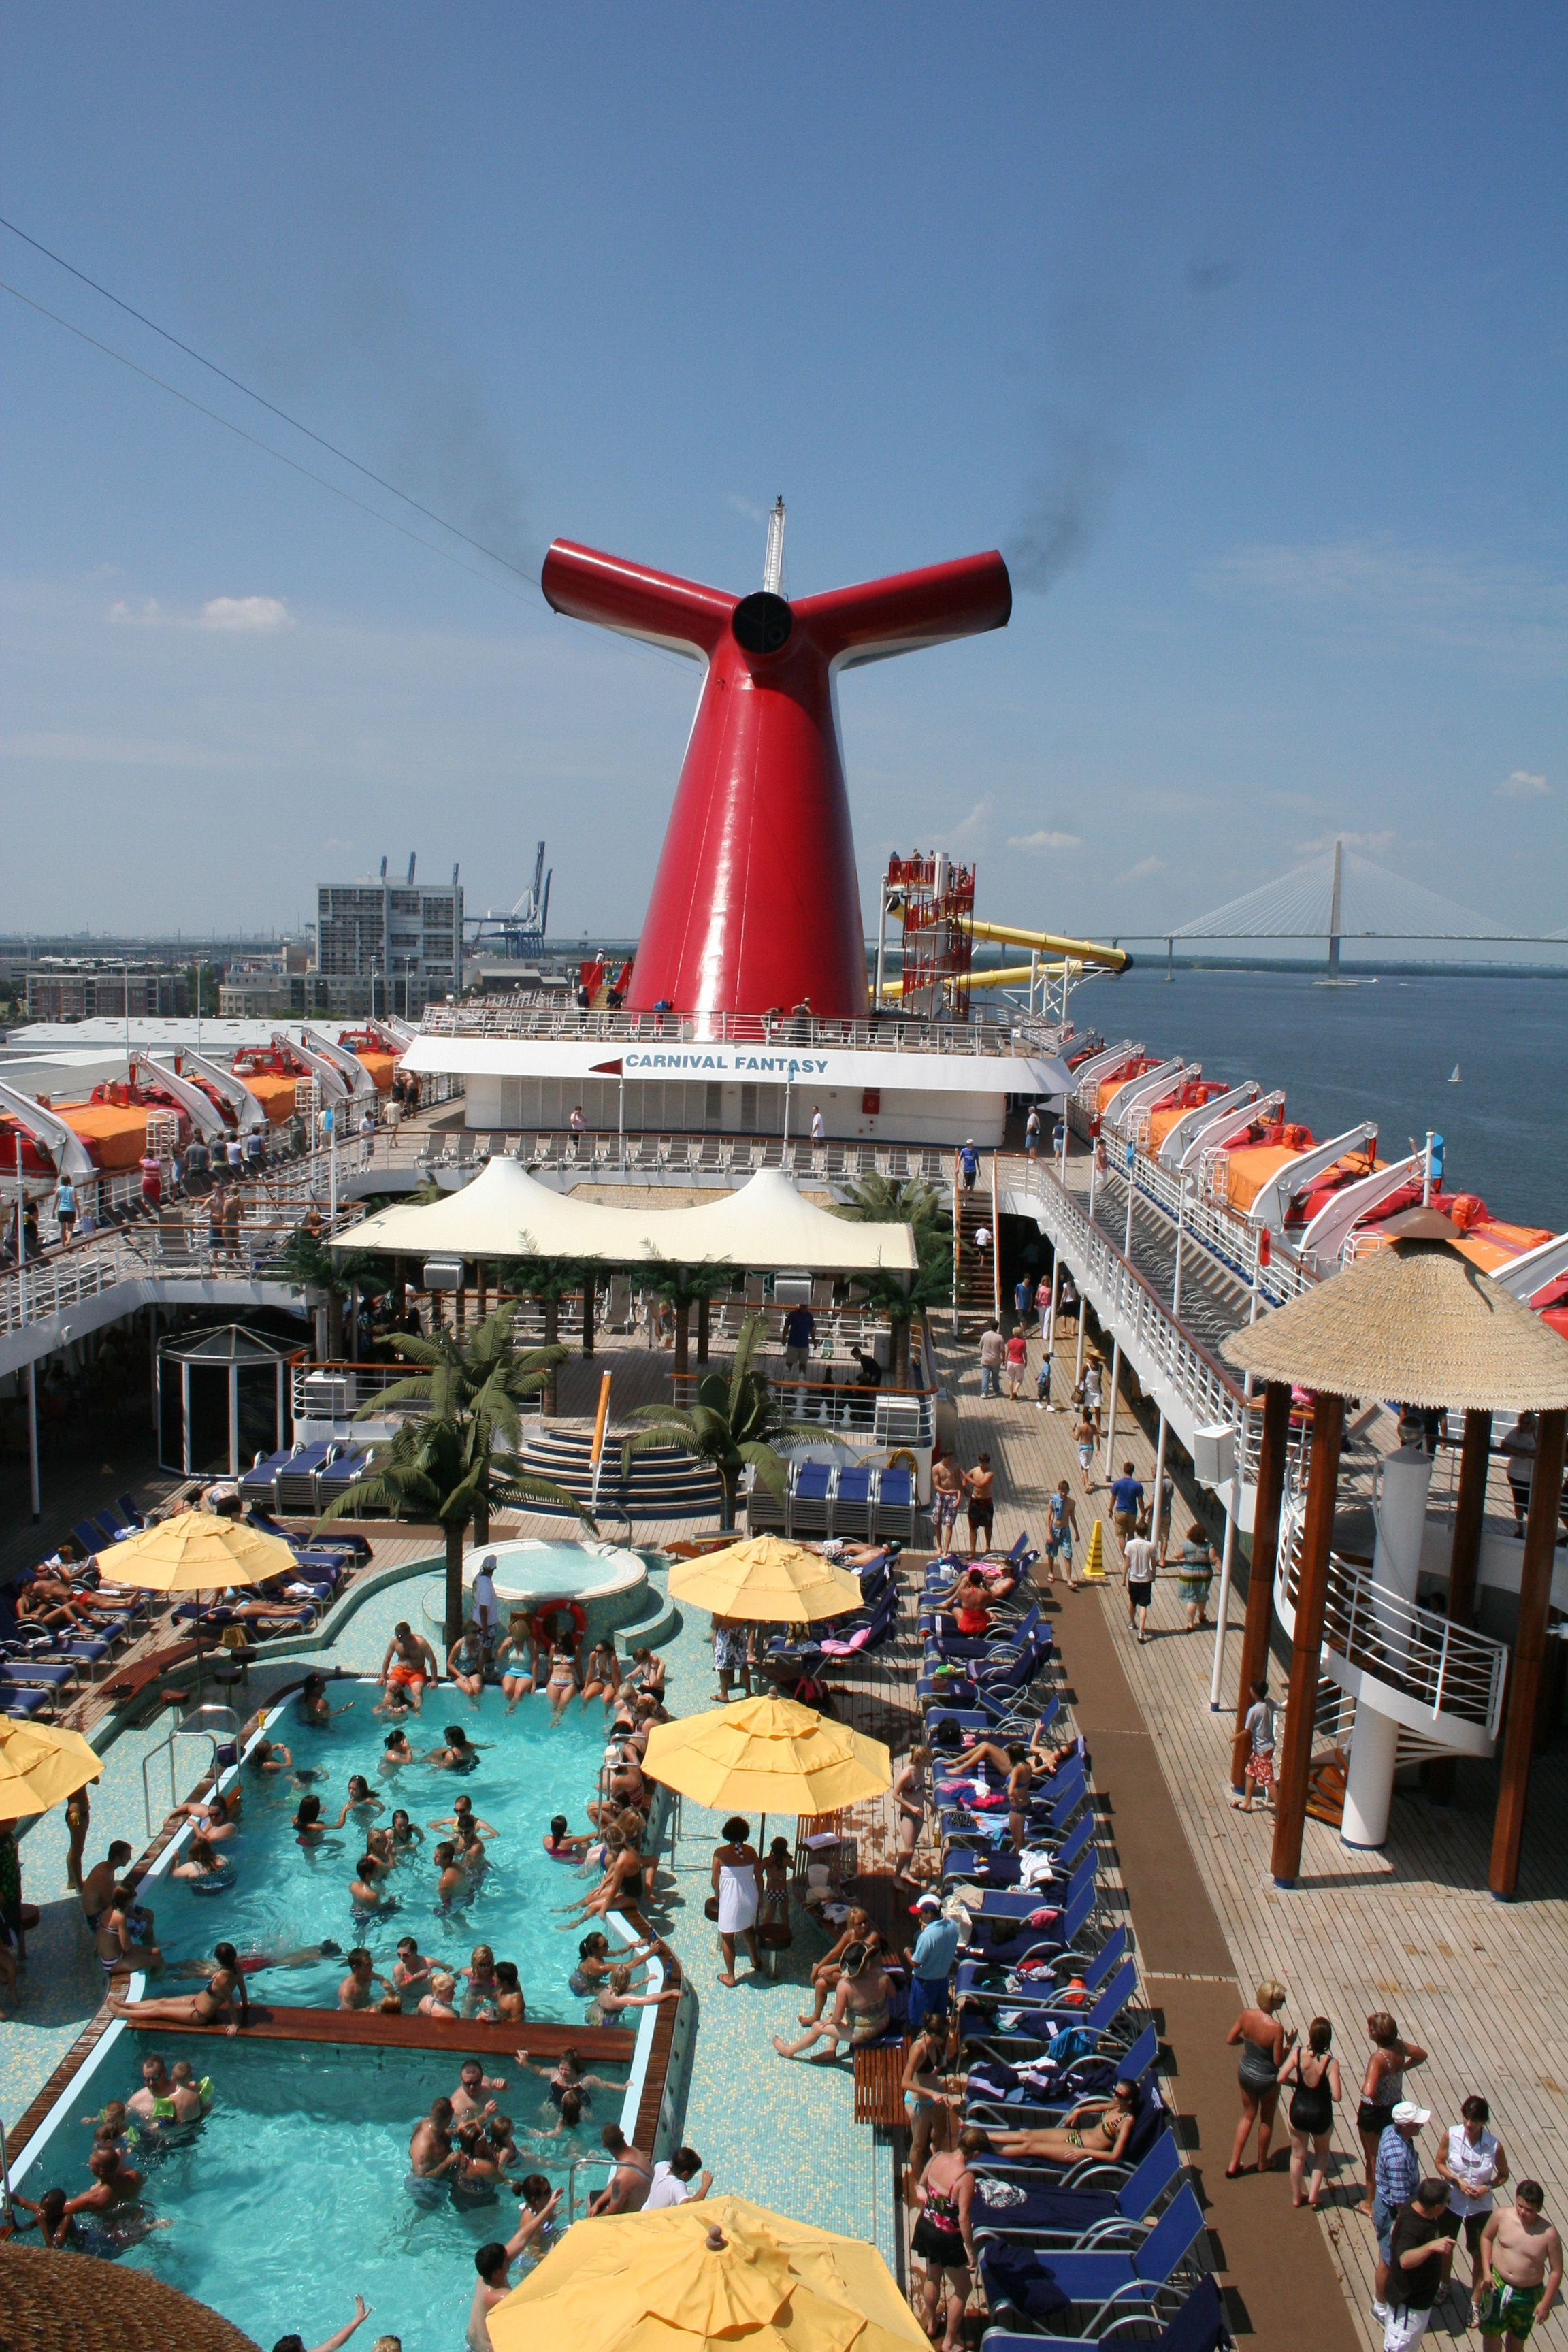 Carnival Fantasy Cruise Pool